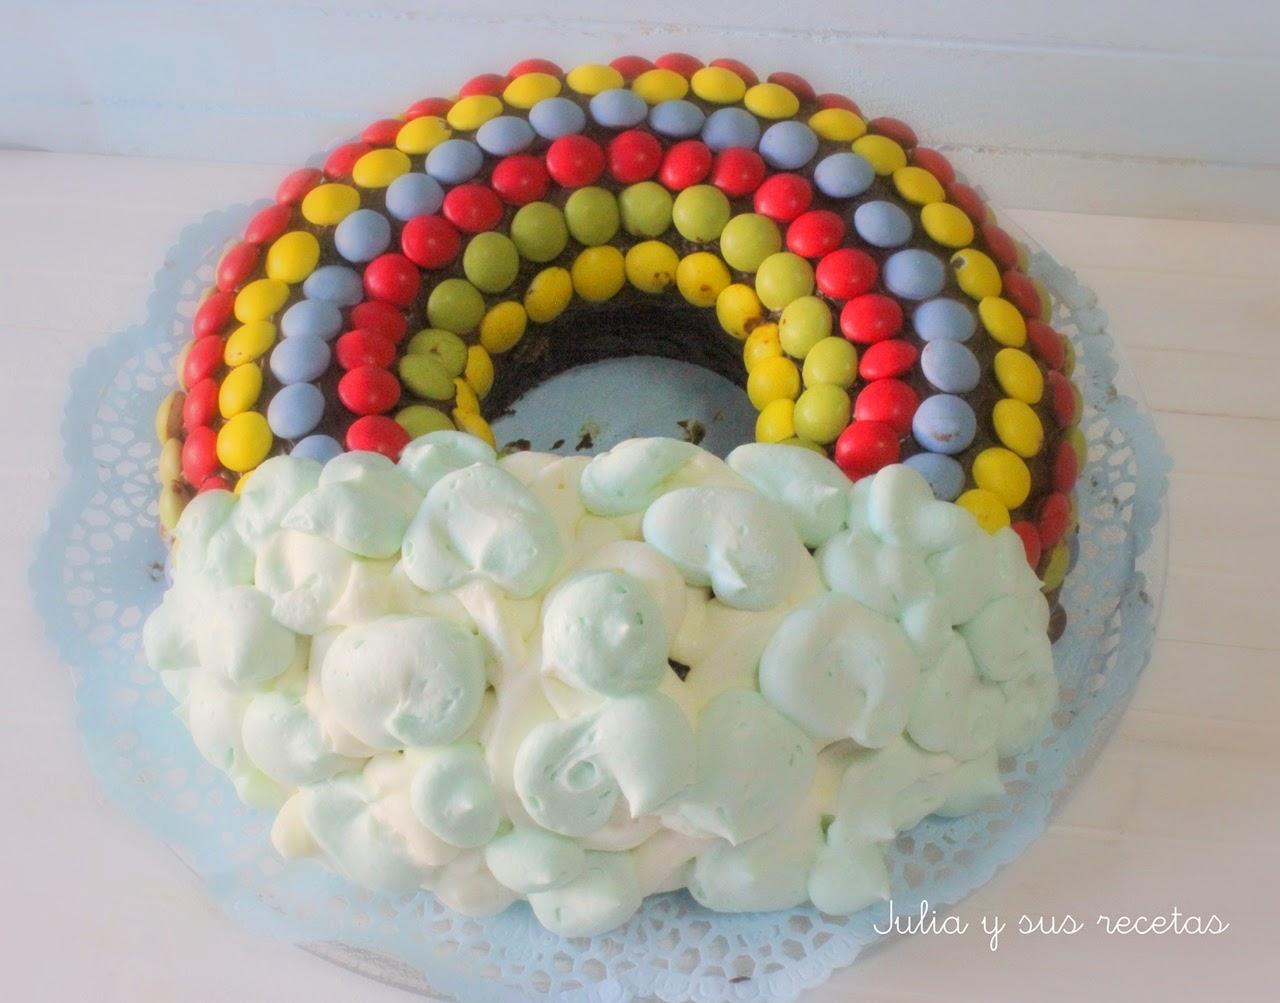 Tarta arco iris. Julia y sus recetas